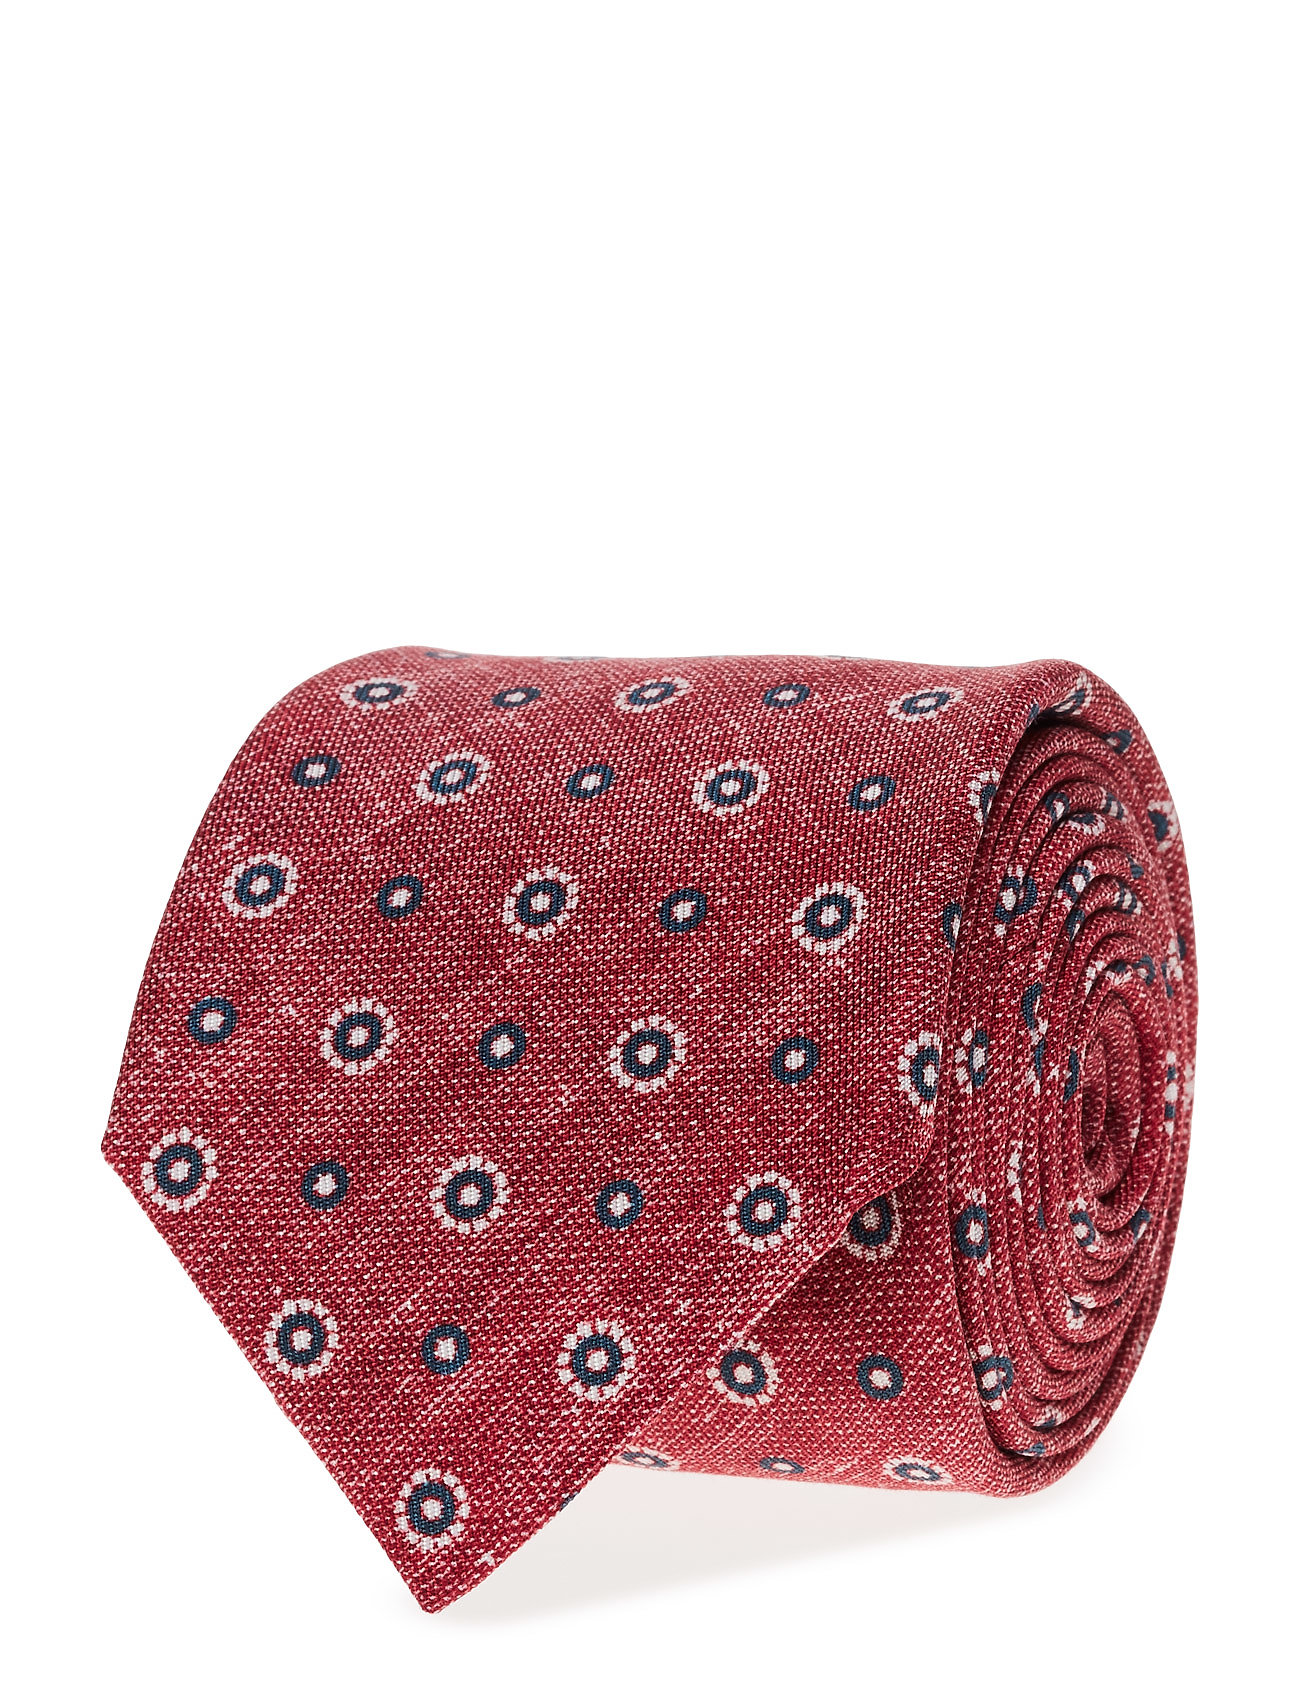 Tie Printed Cotton (2453068467)